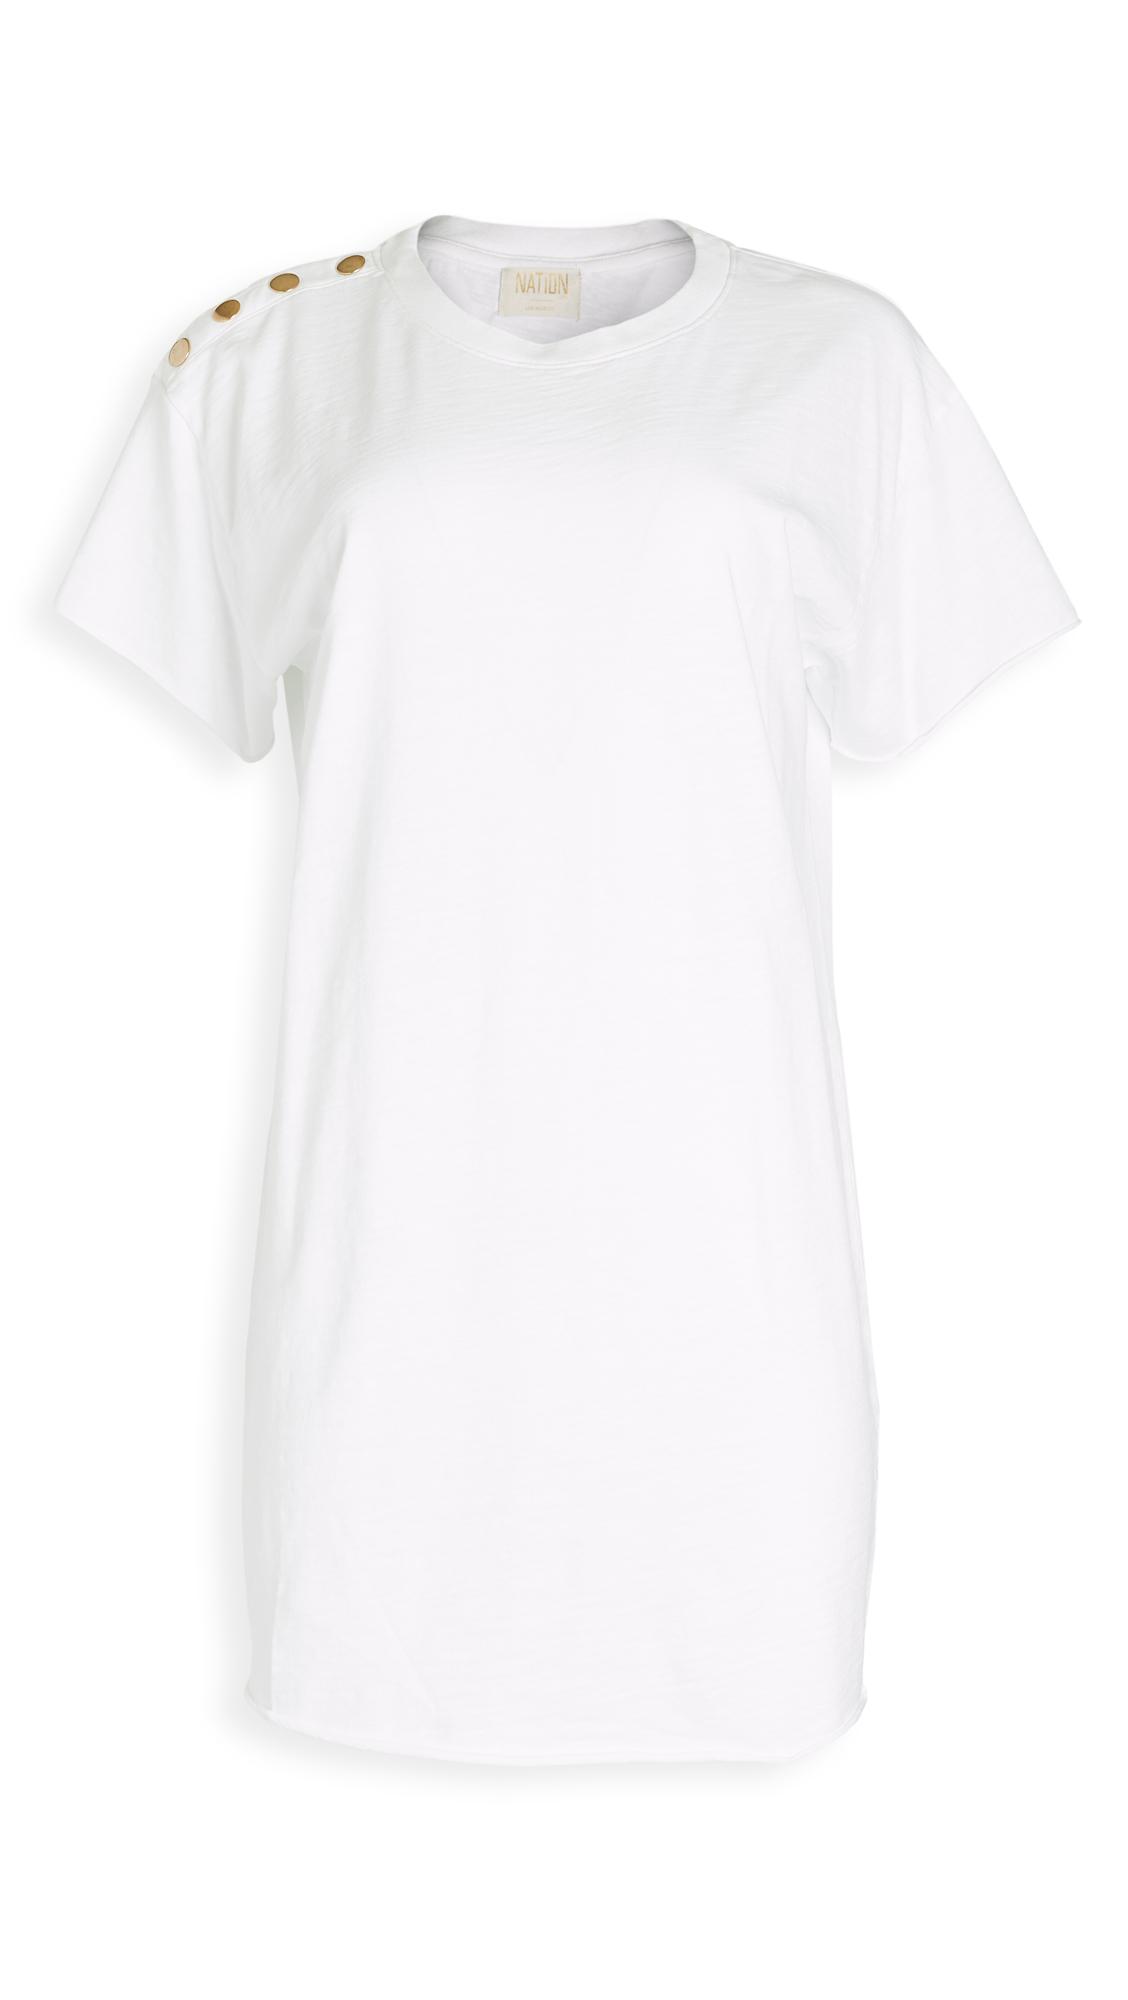 Nation LTD Rowan T Shirt Dress